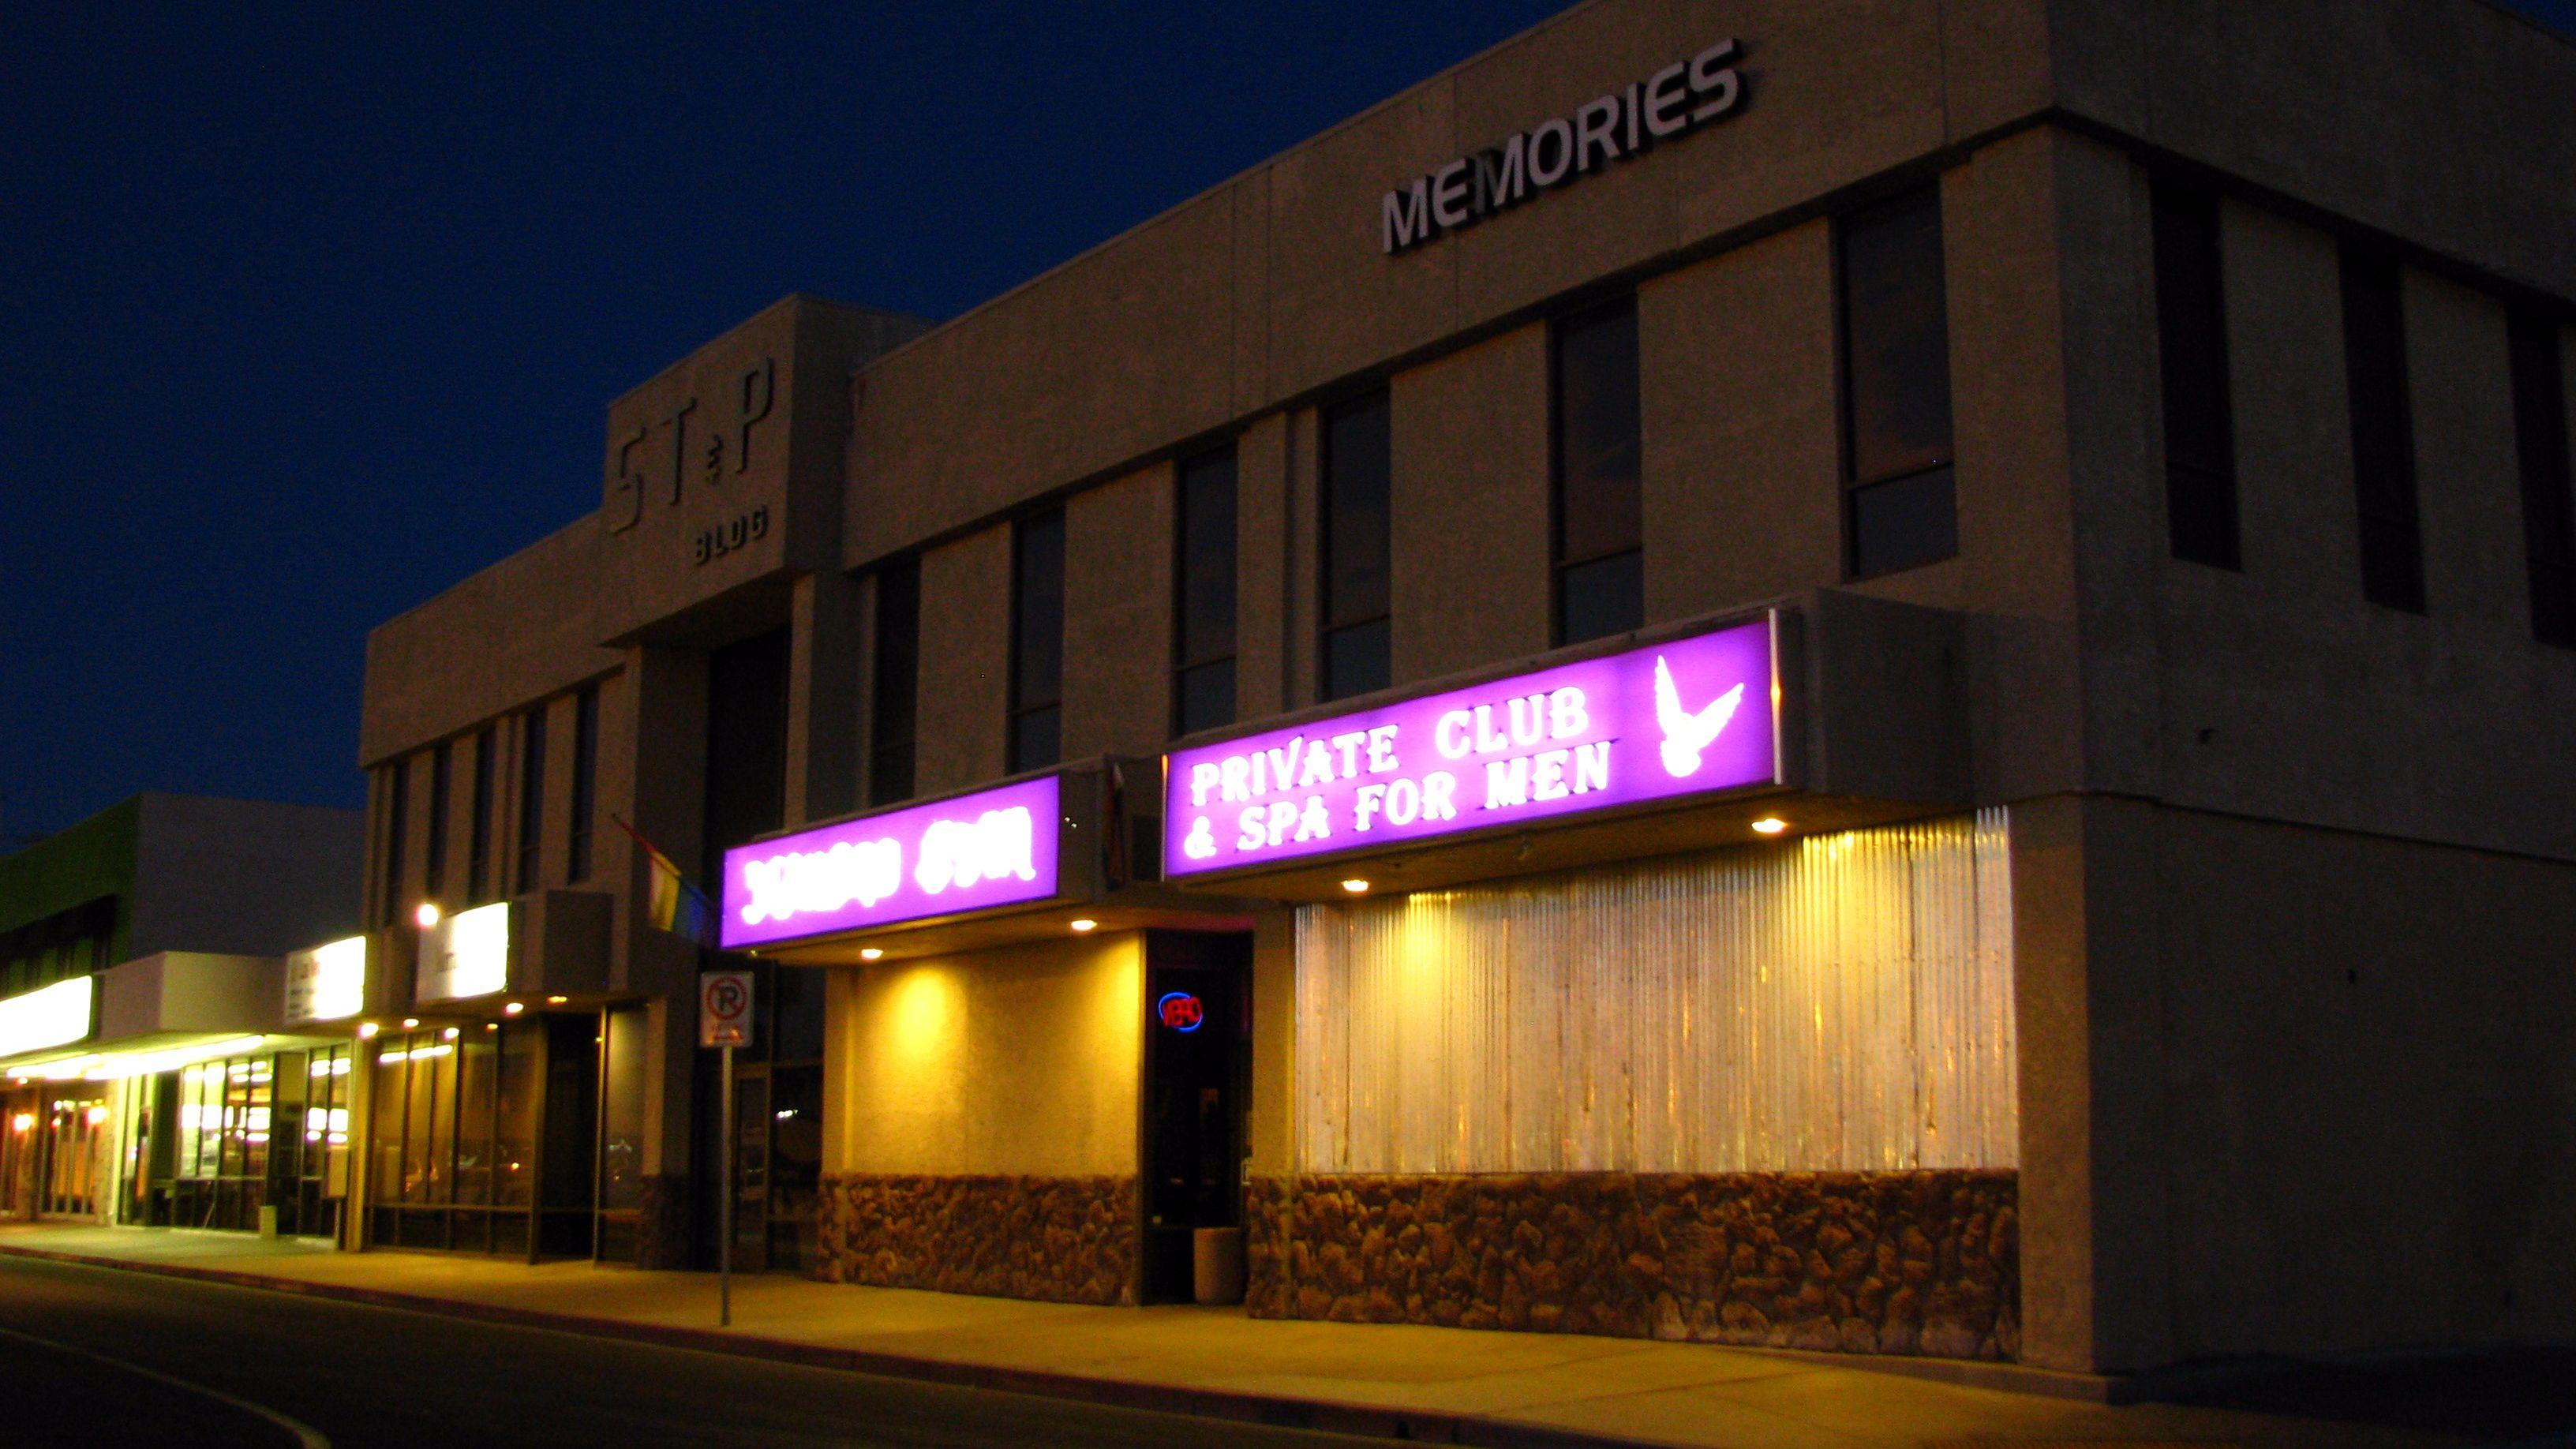 Homofil dating sites Las Vegas